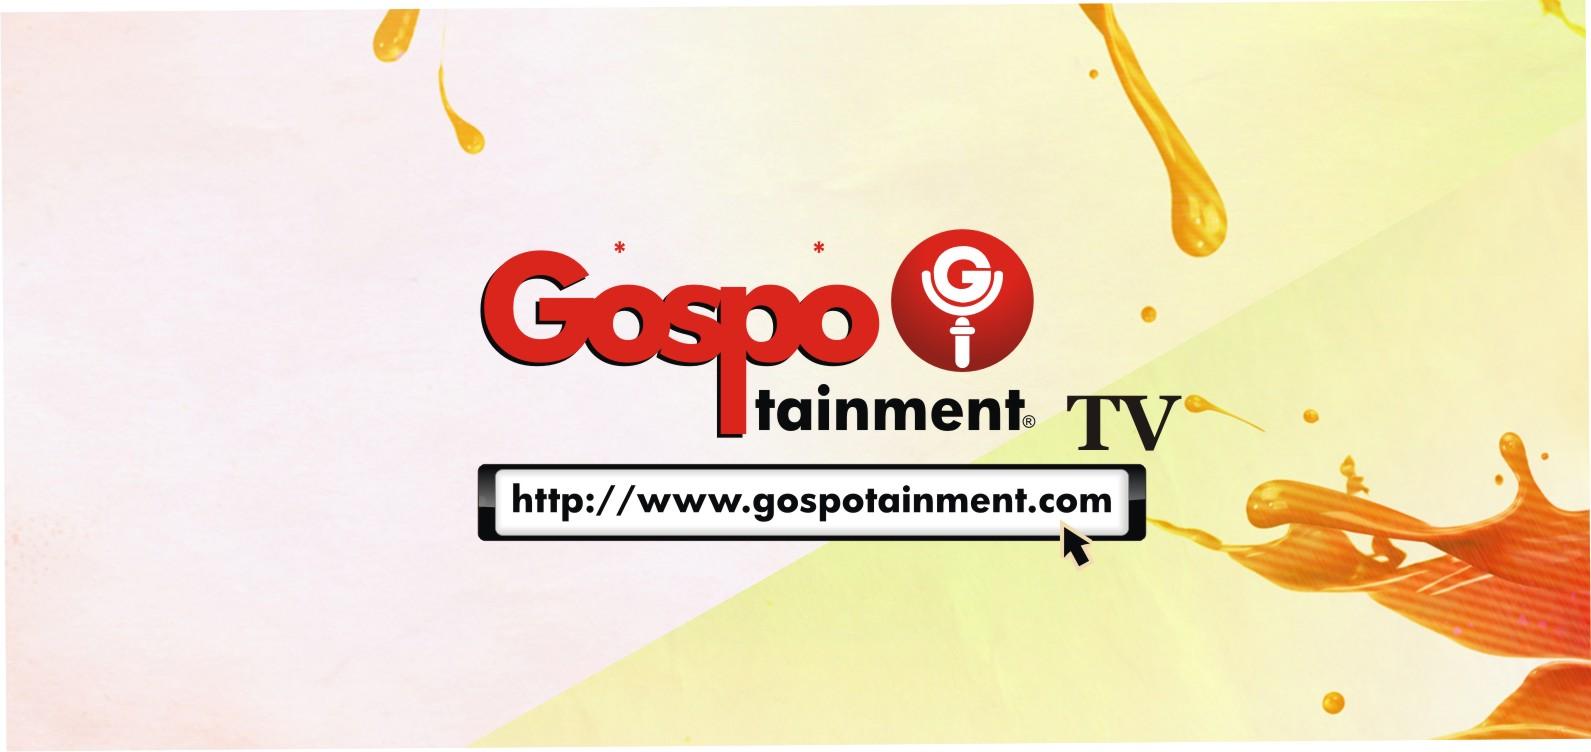 Gospotainment TV